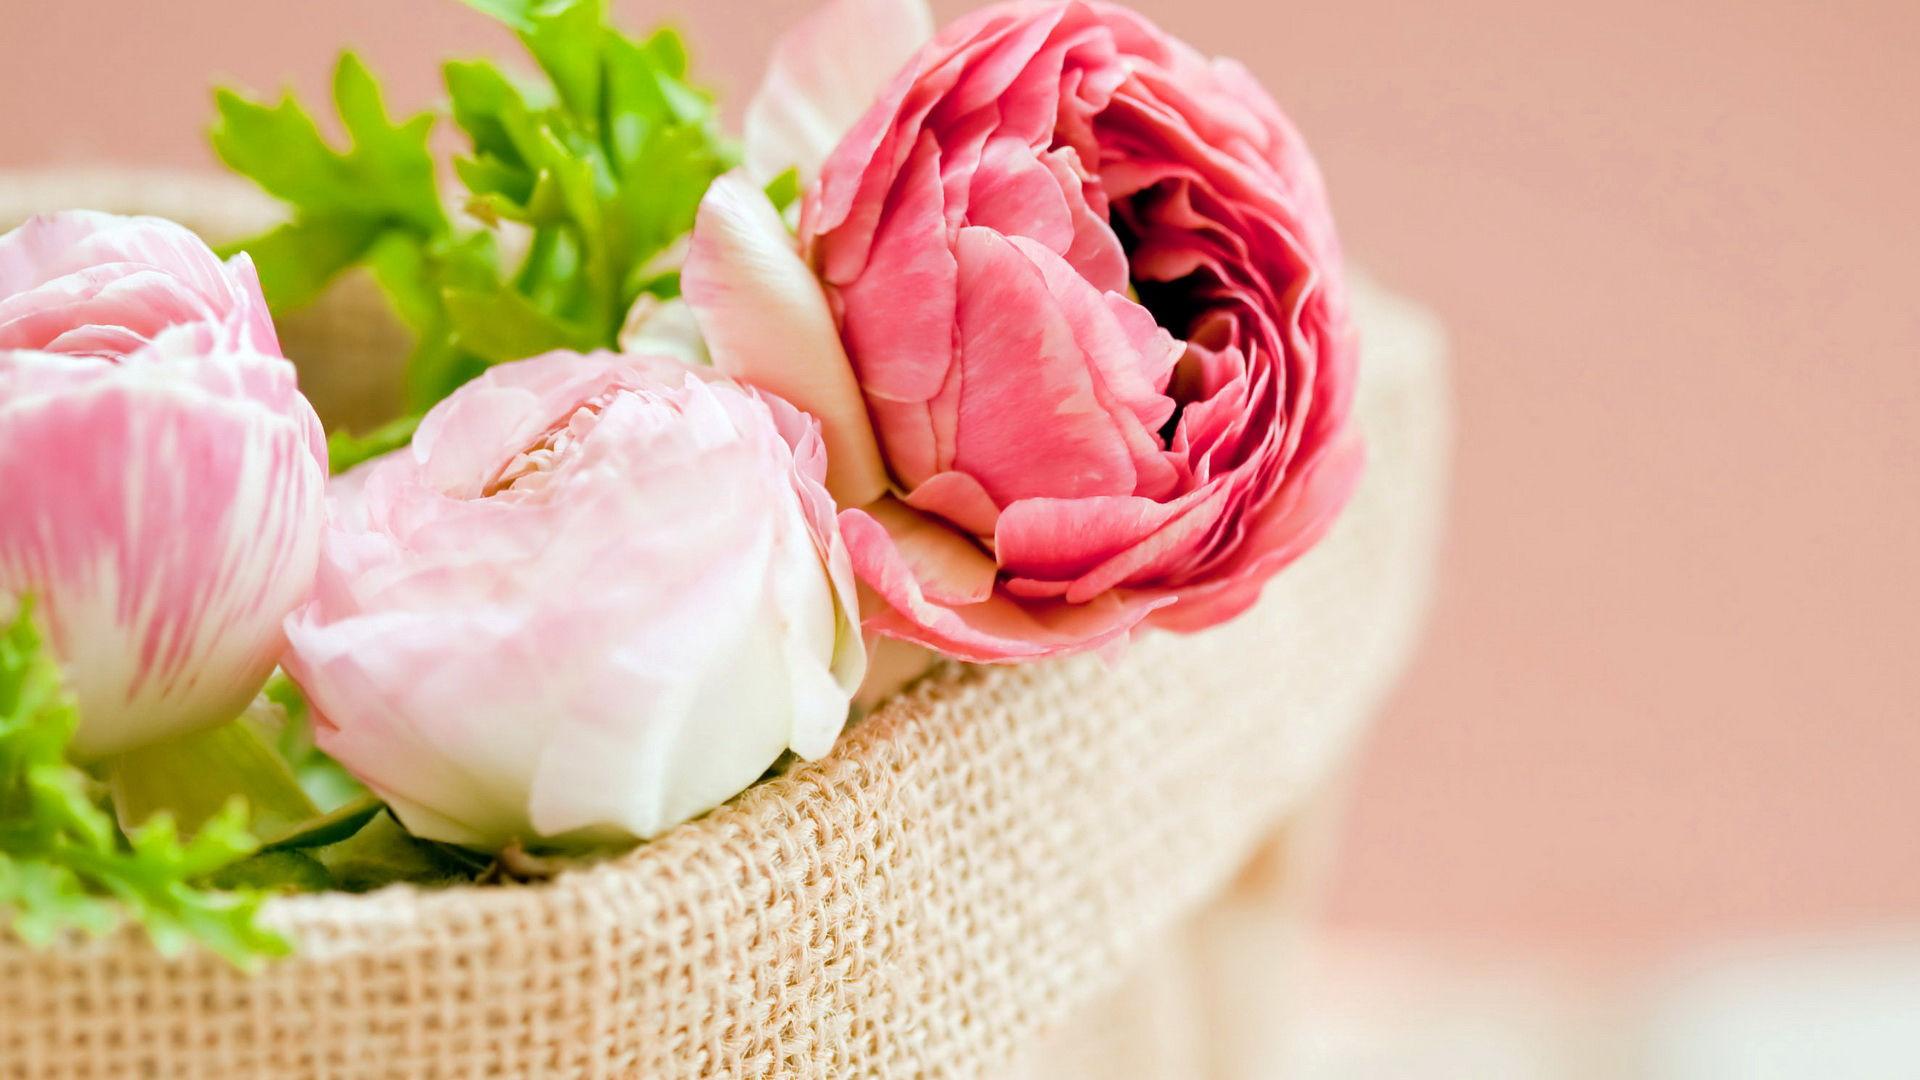 fonds d'écran fleurs roses - maximumwallhd